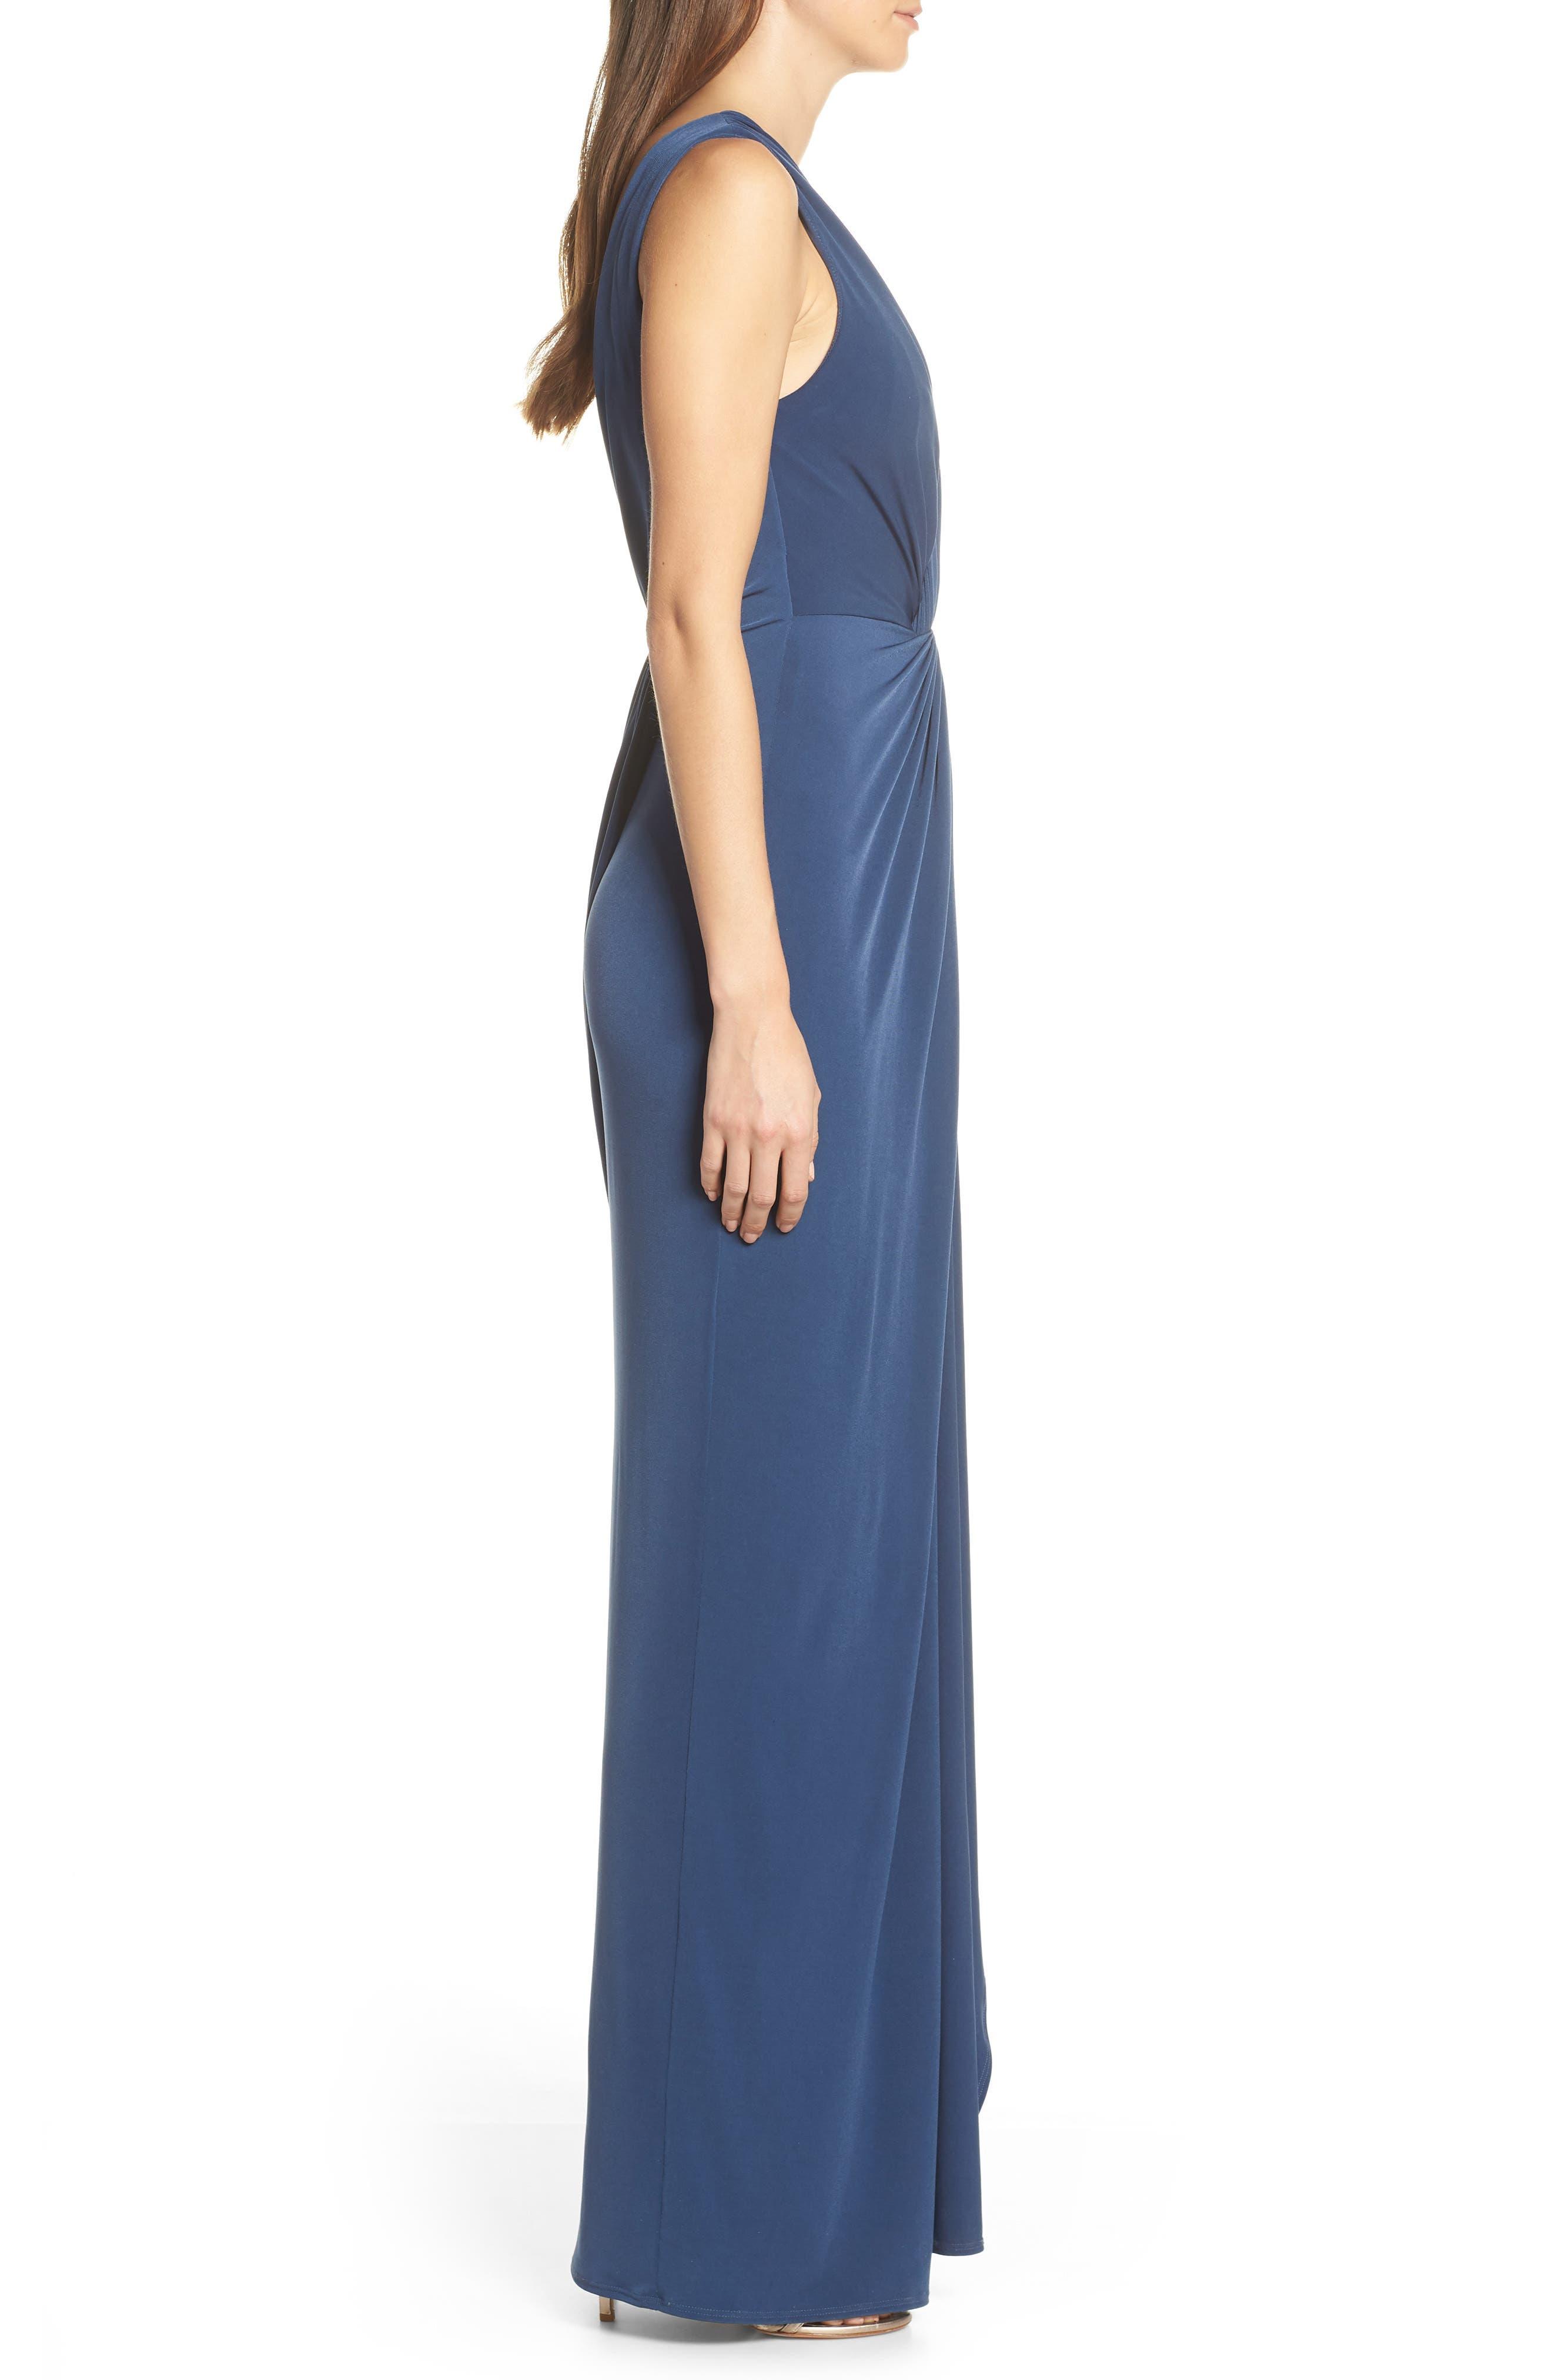 KATIE MAY, Leo Twist Front Evening Dress, Alternate thumbnail 4, color, DEEP SEA